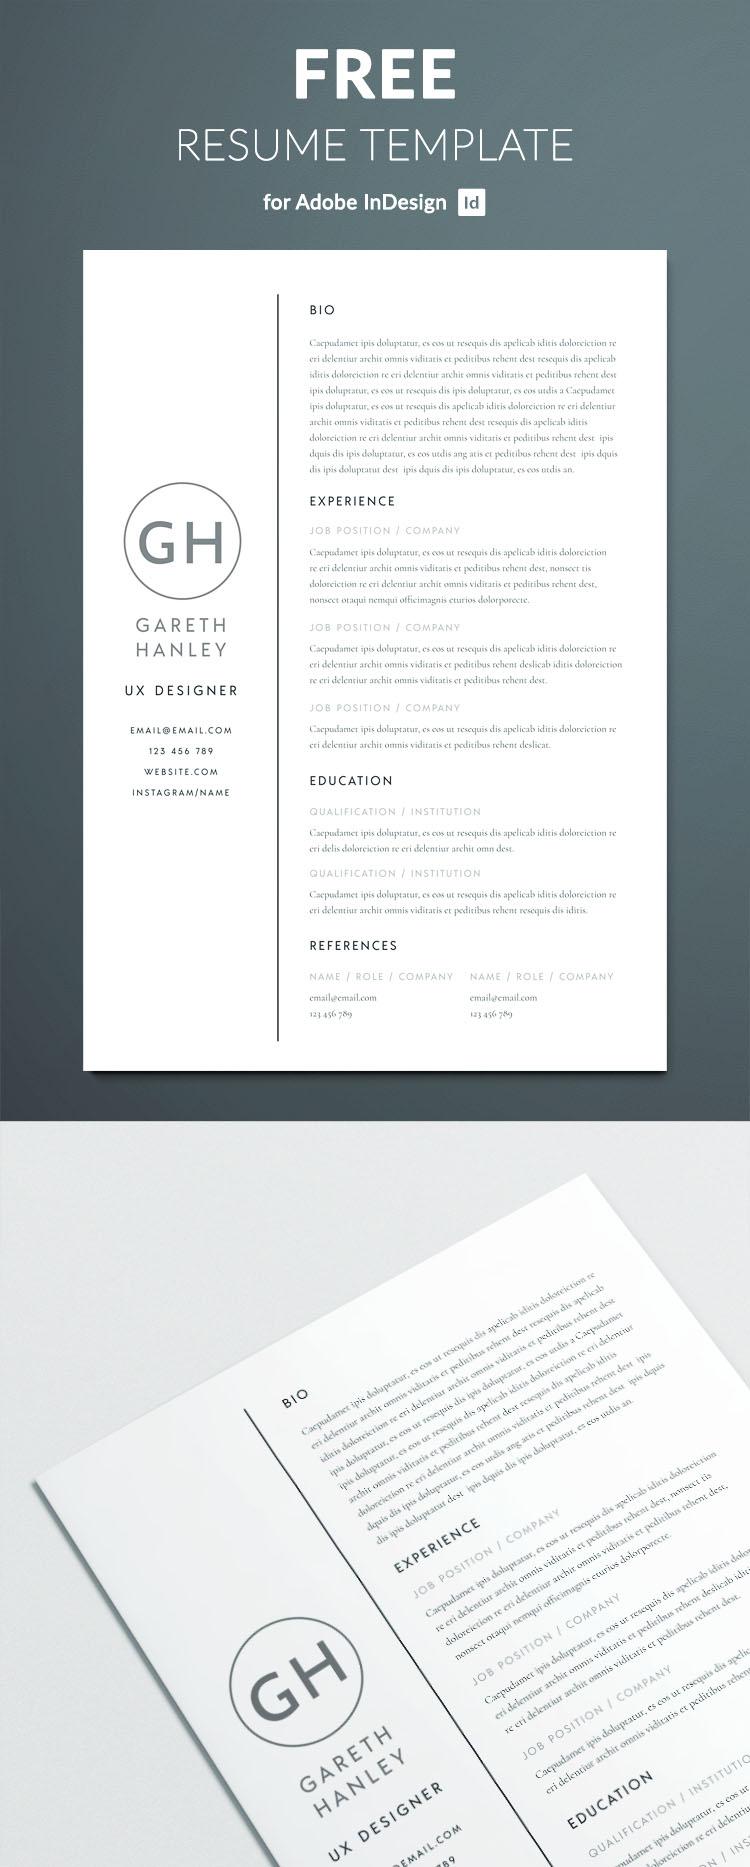 idml resume template